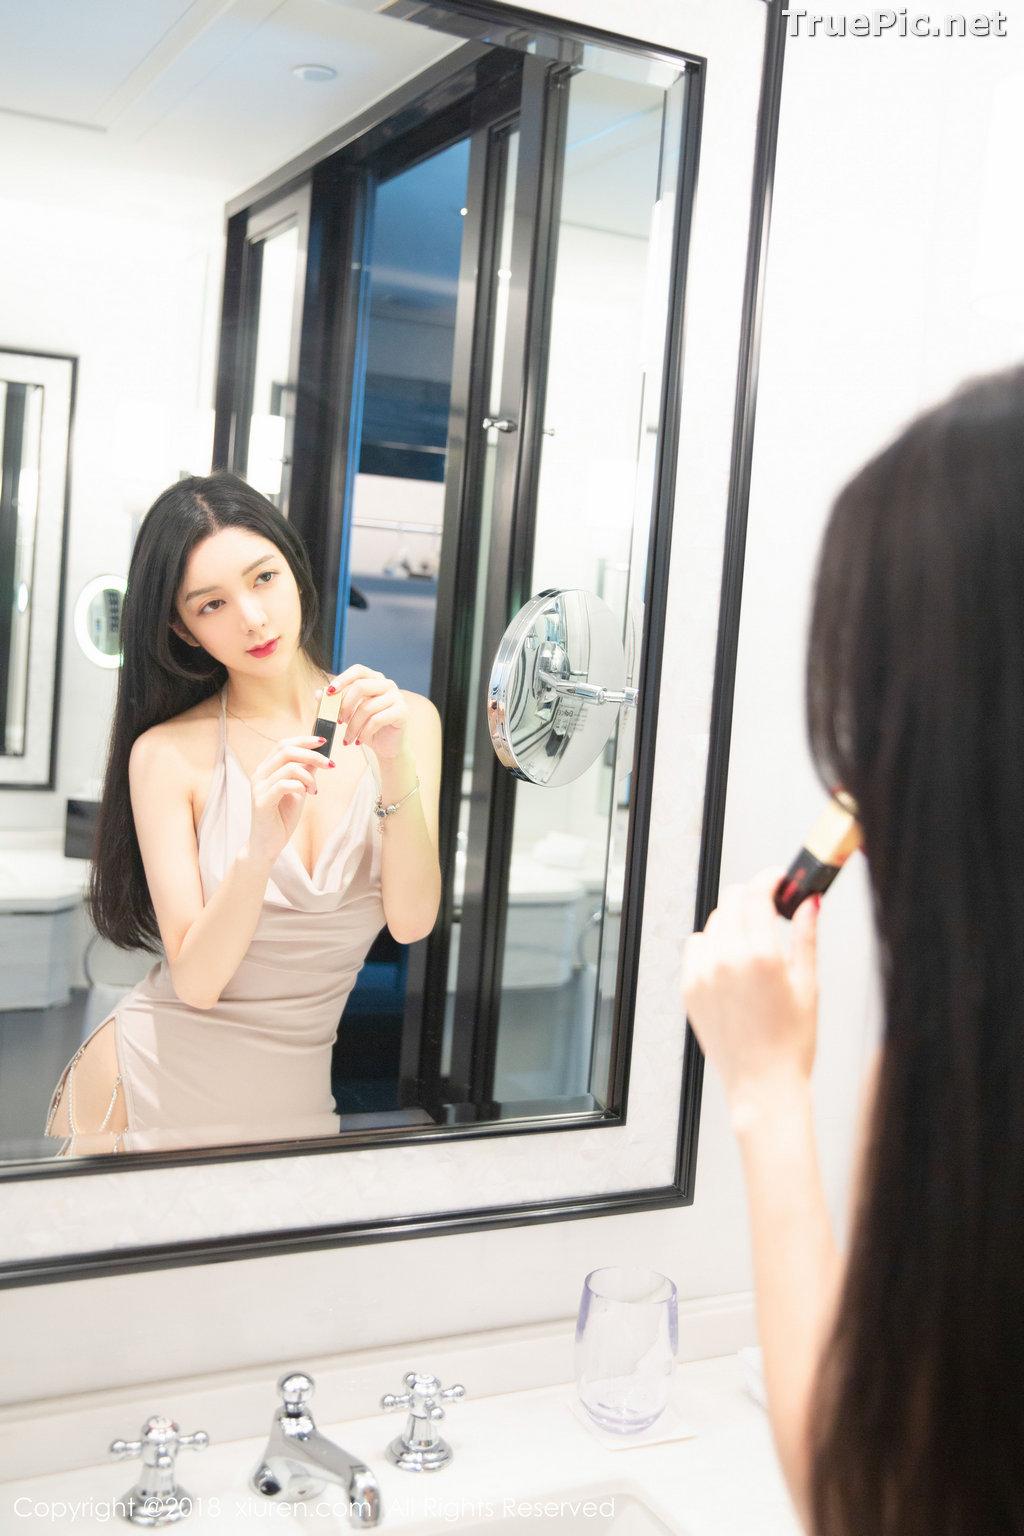 Image XIUREN No.1141 - Chinese Model - Xiao Reba (Angela小热巴) - Sexy Dress Tonight - TruePic.net - Picture-30